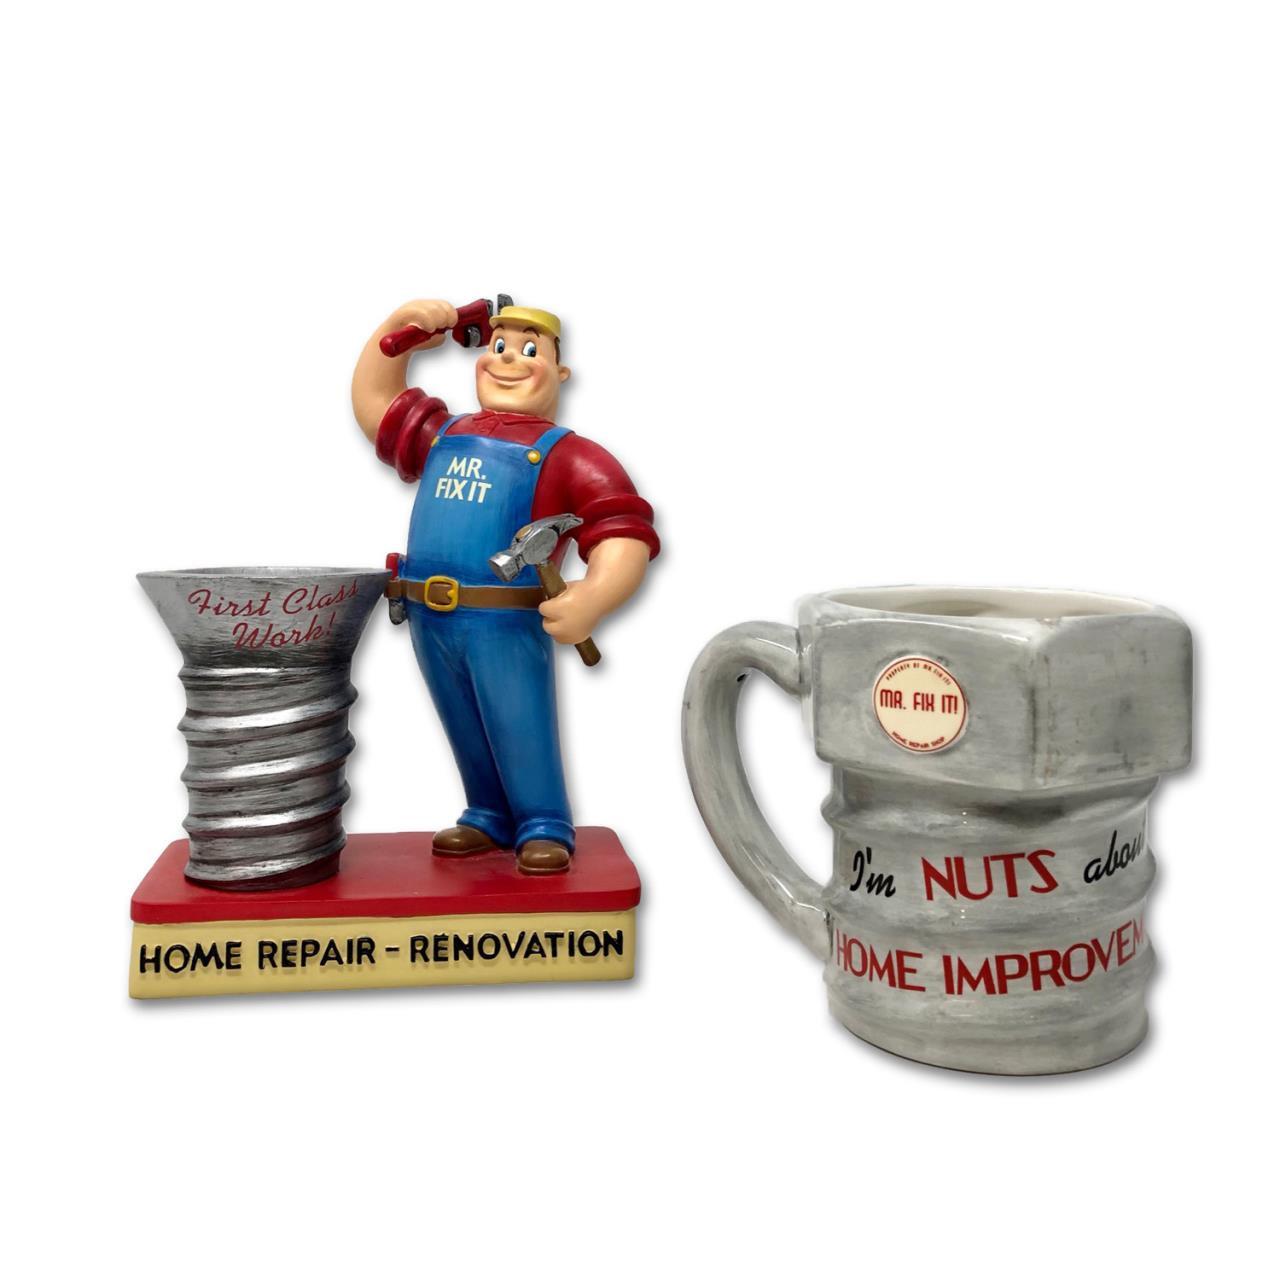 Mr. Fix It: Home Repair Lot Of 2 -